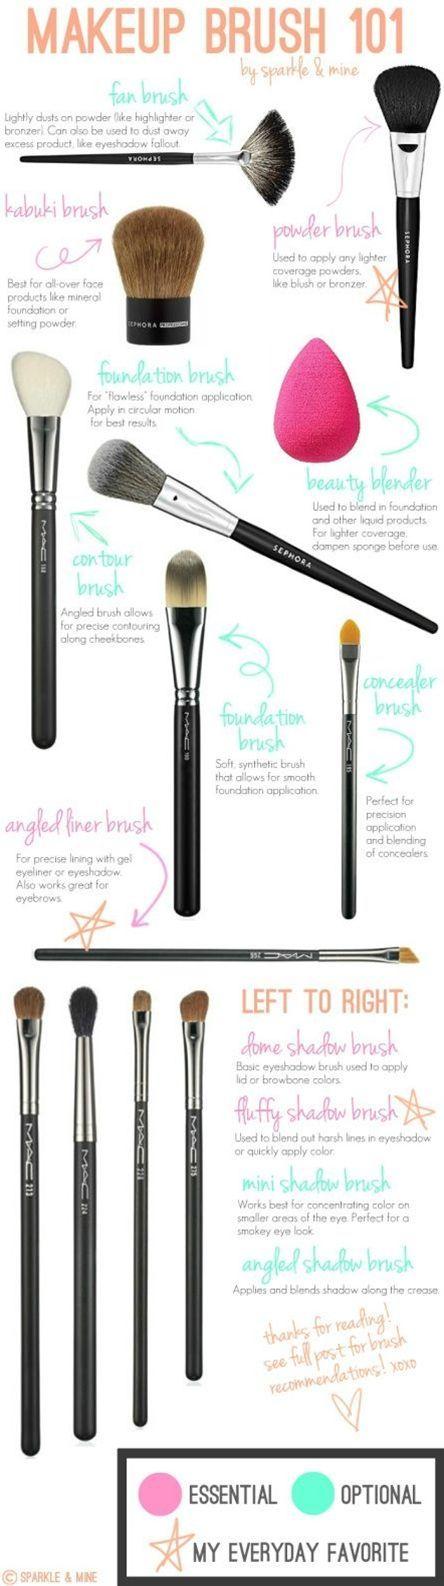 Make up brushes... Definitely need some new ones!